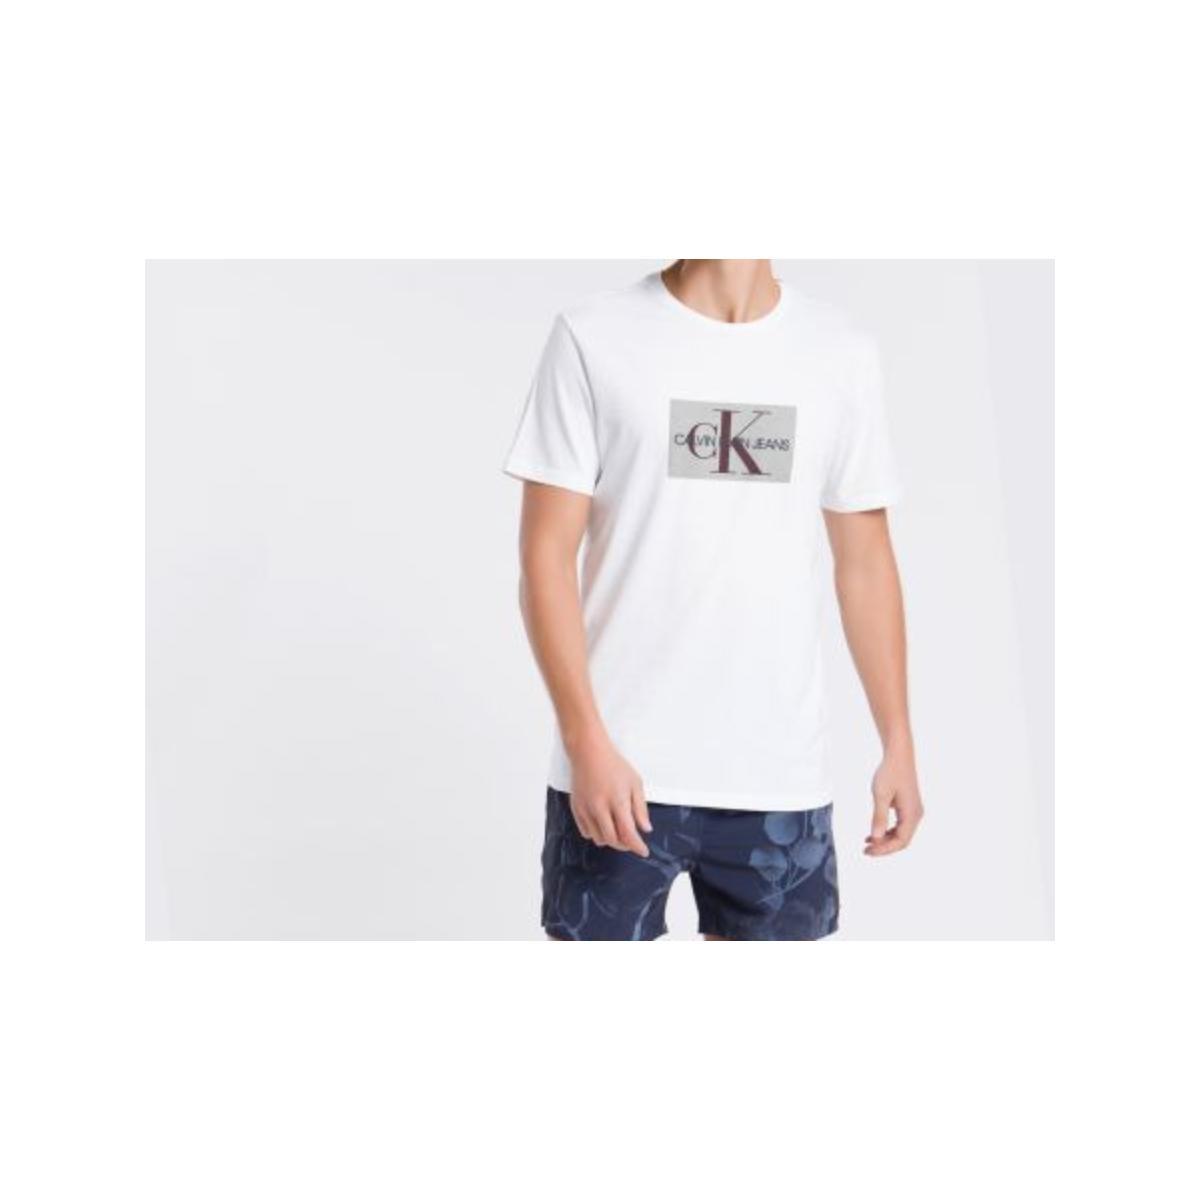 Camiseta Masculina Calvin Klein Cm1oc01i4014 Branco